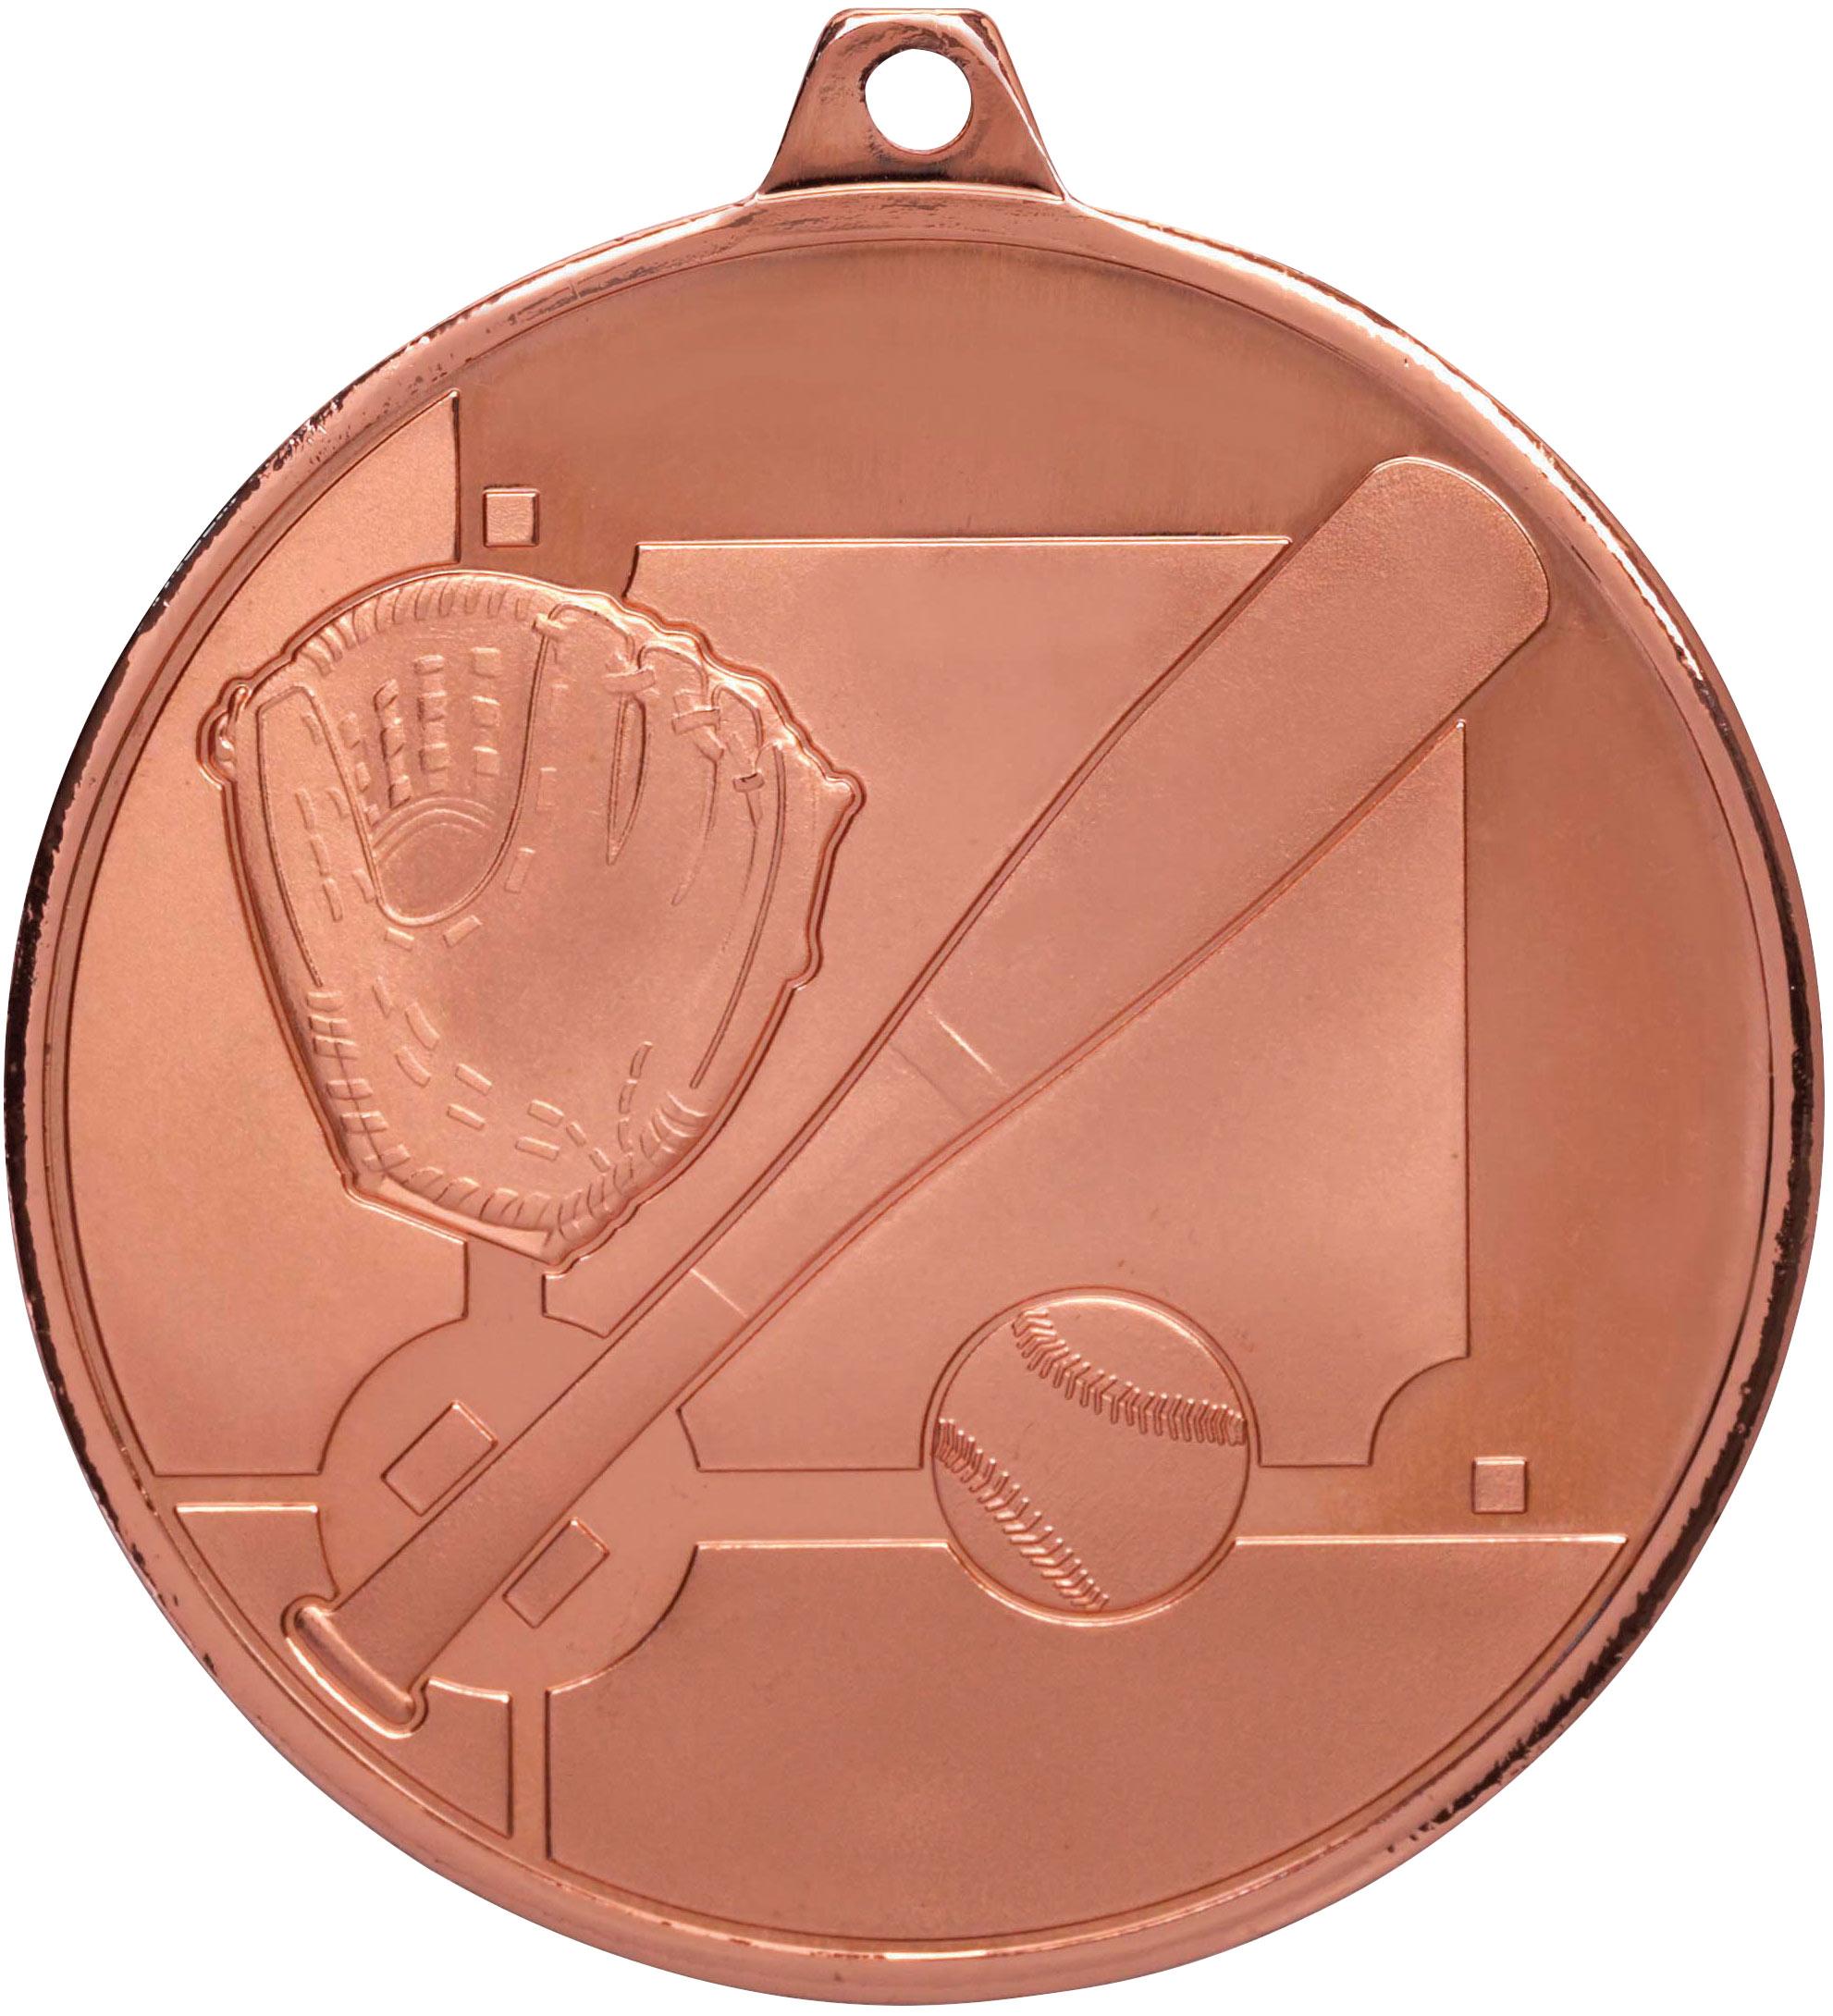 Baseball-Softball Medal MZ903B 50mm